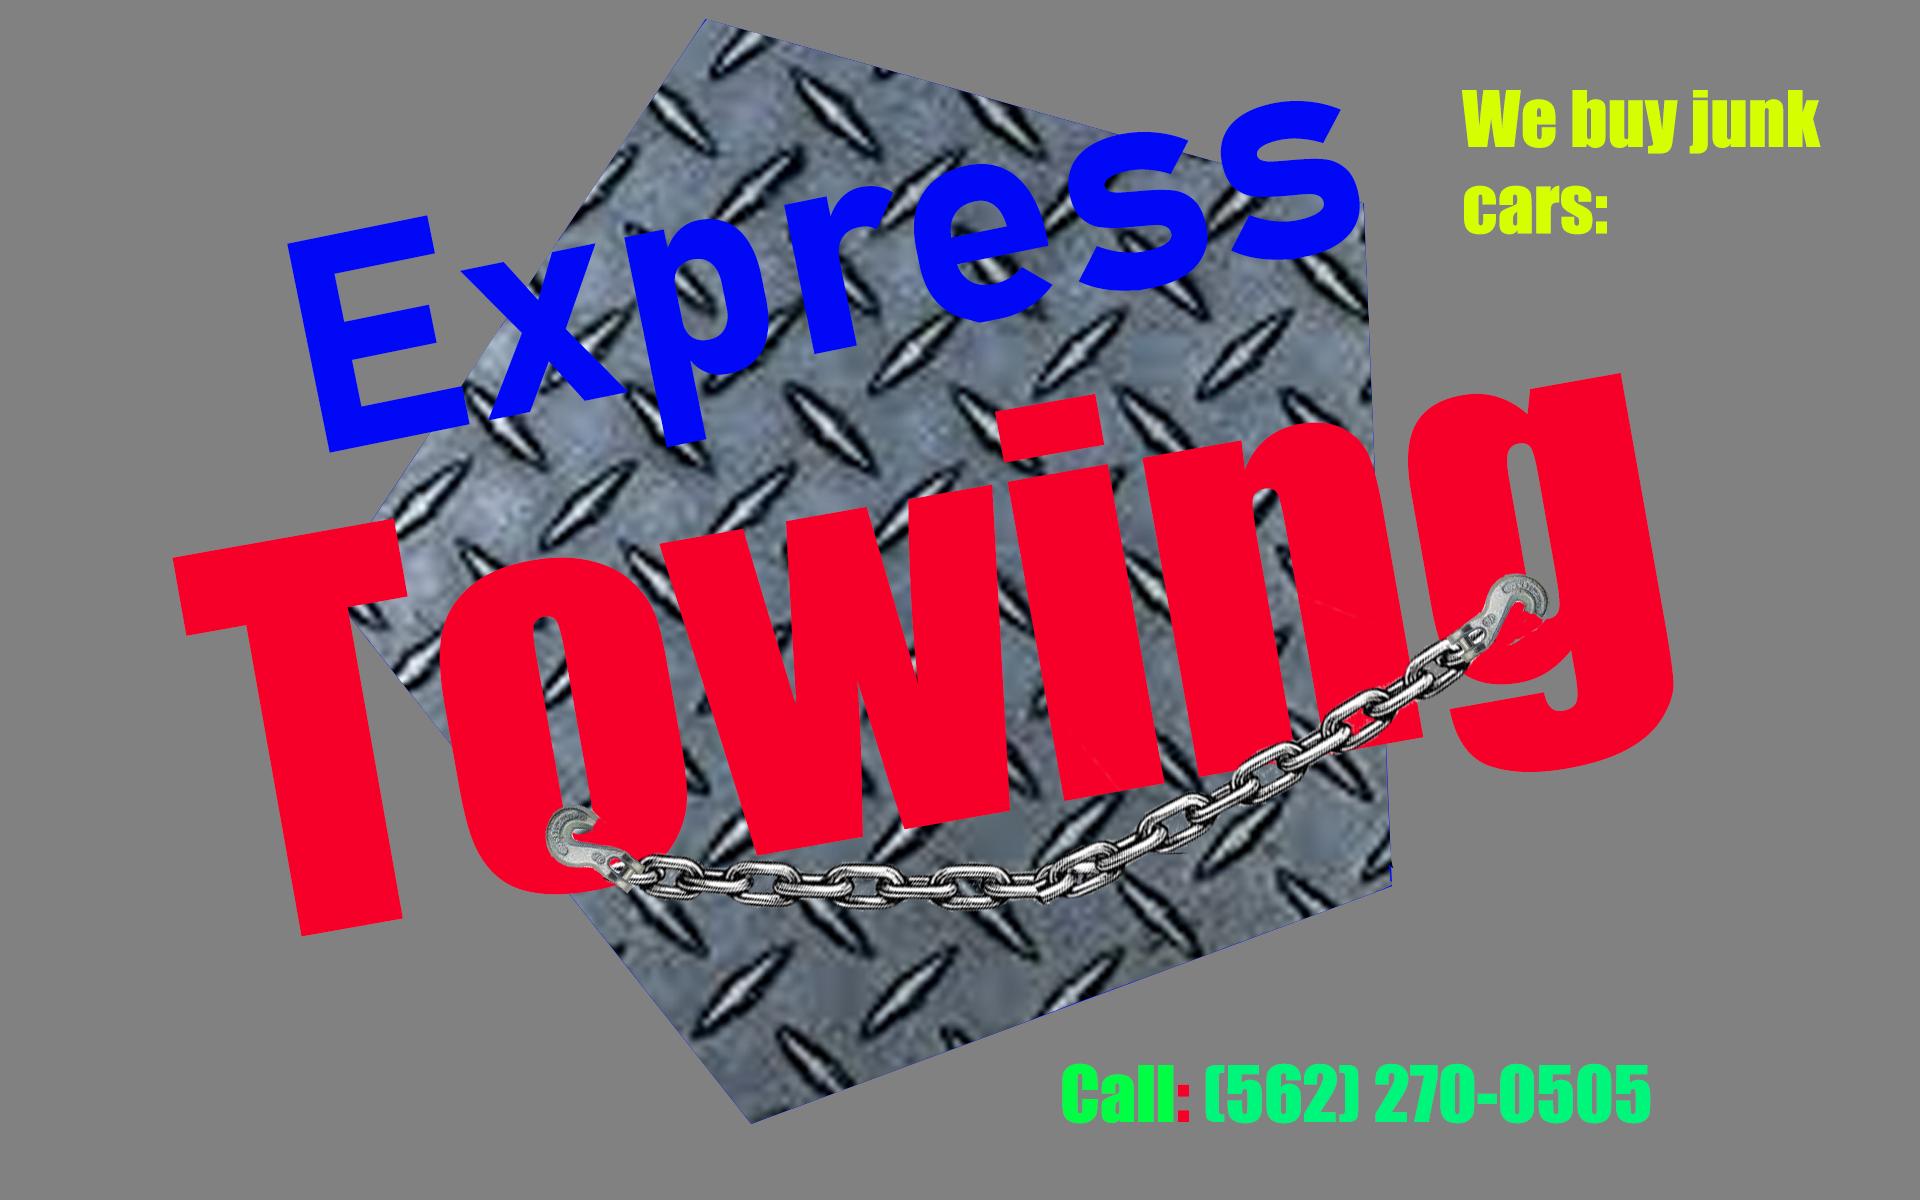 Express junk cars/ We'll pay you top dollar